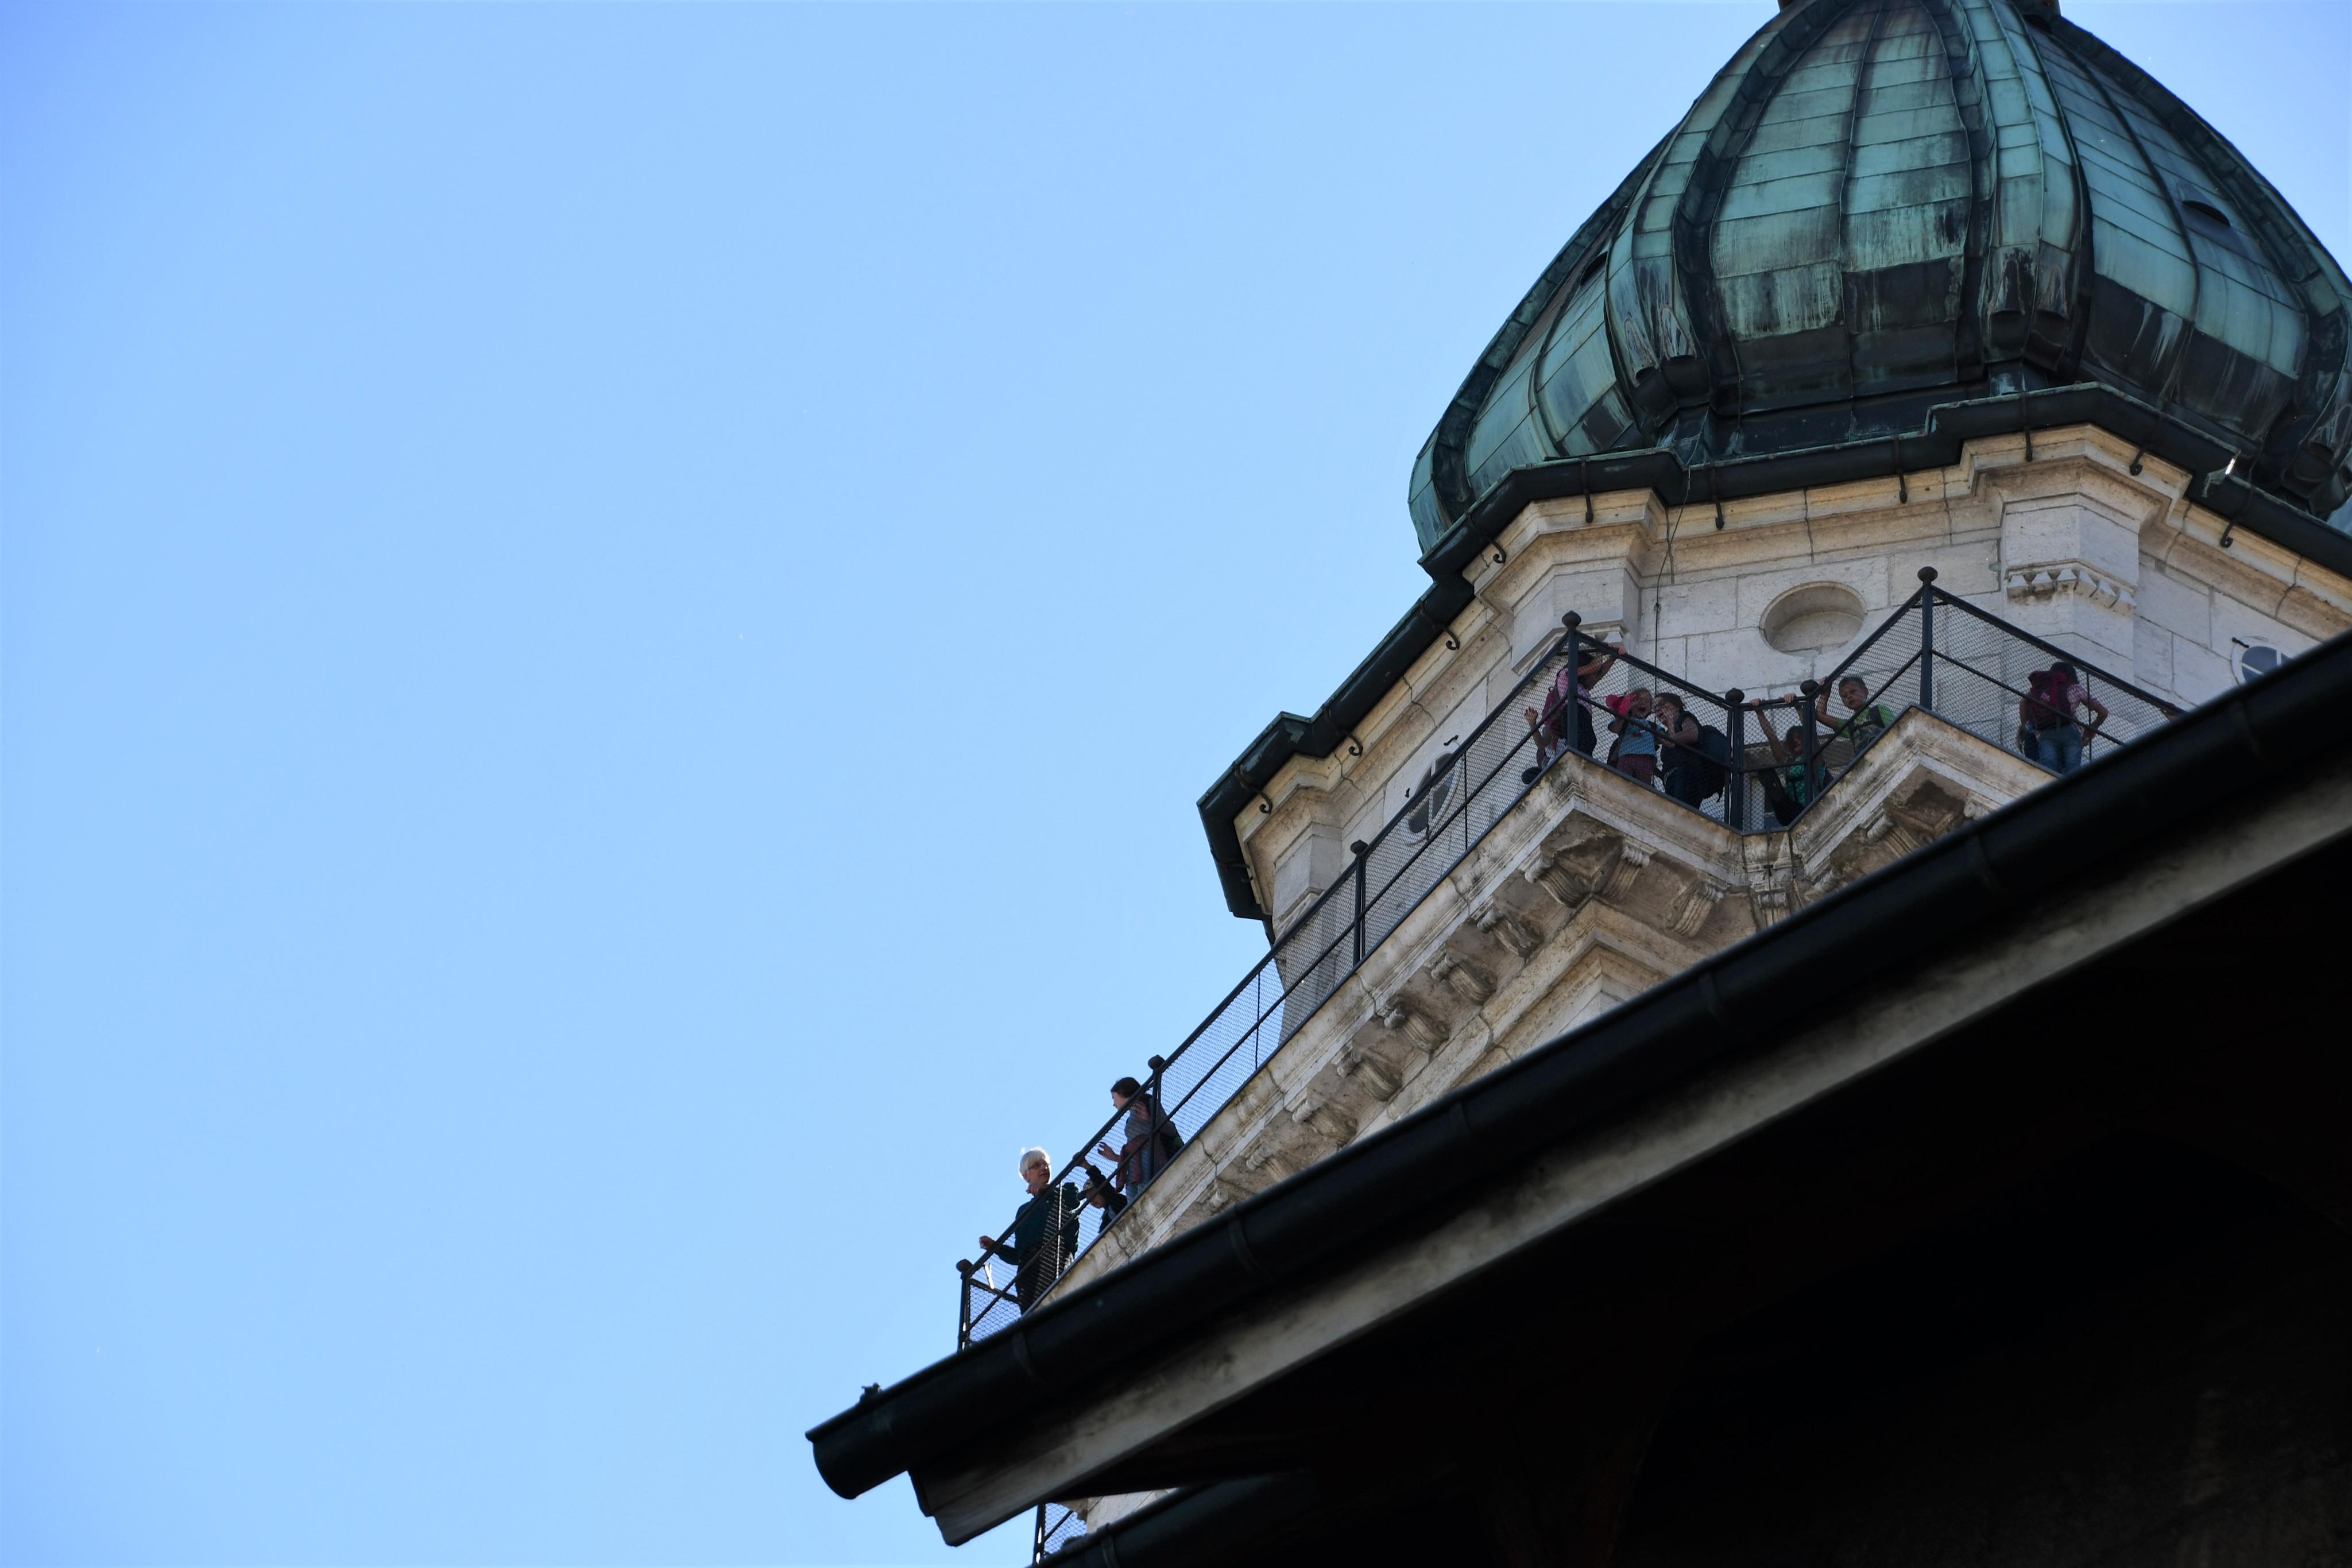 st.-urs-public-balcony-12.09.2019